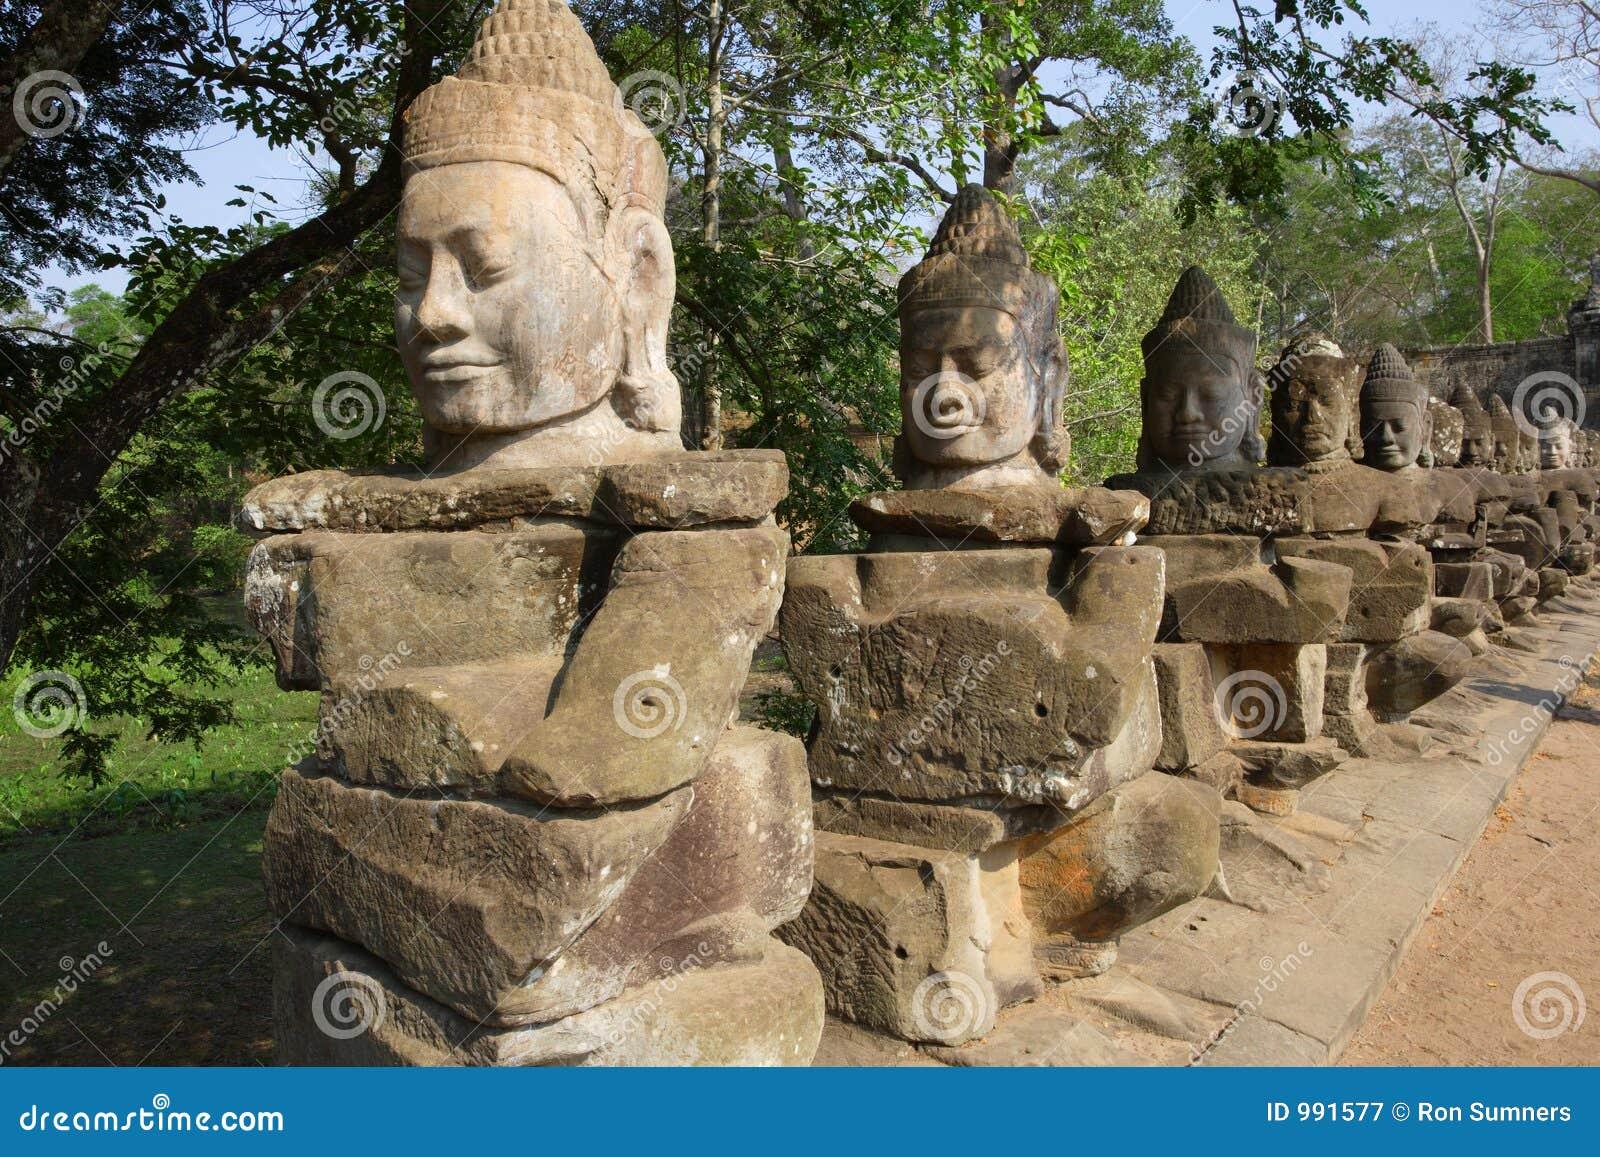 Statues in Cambodia